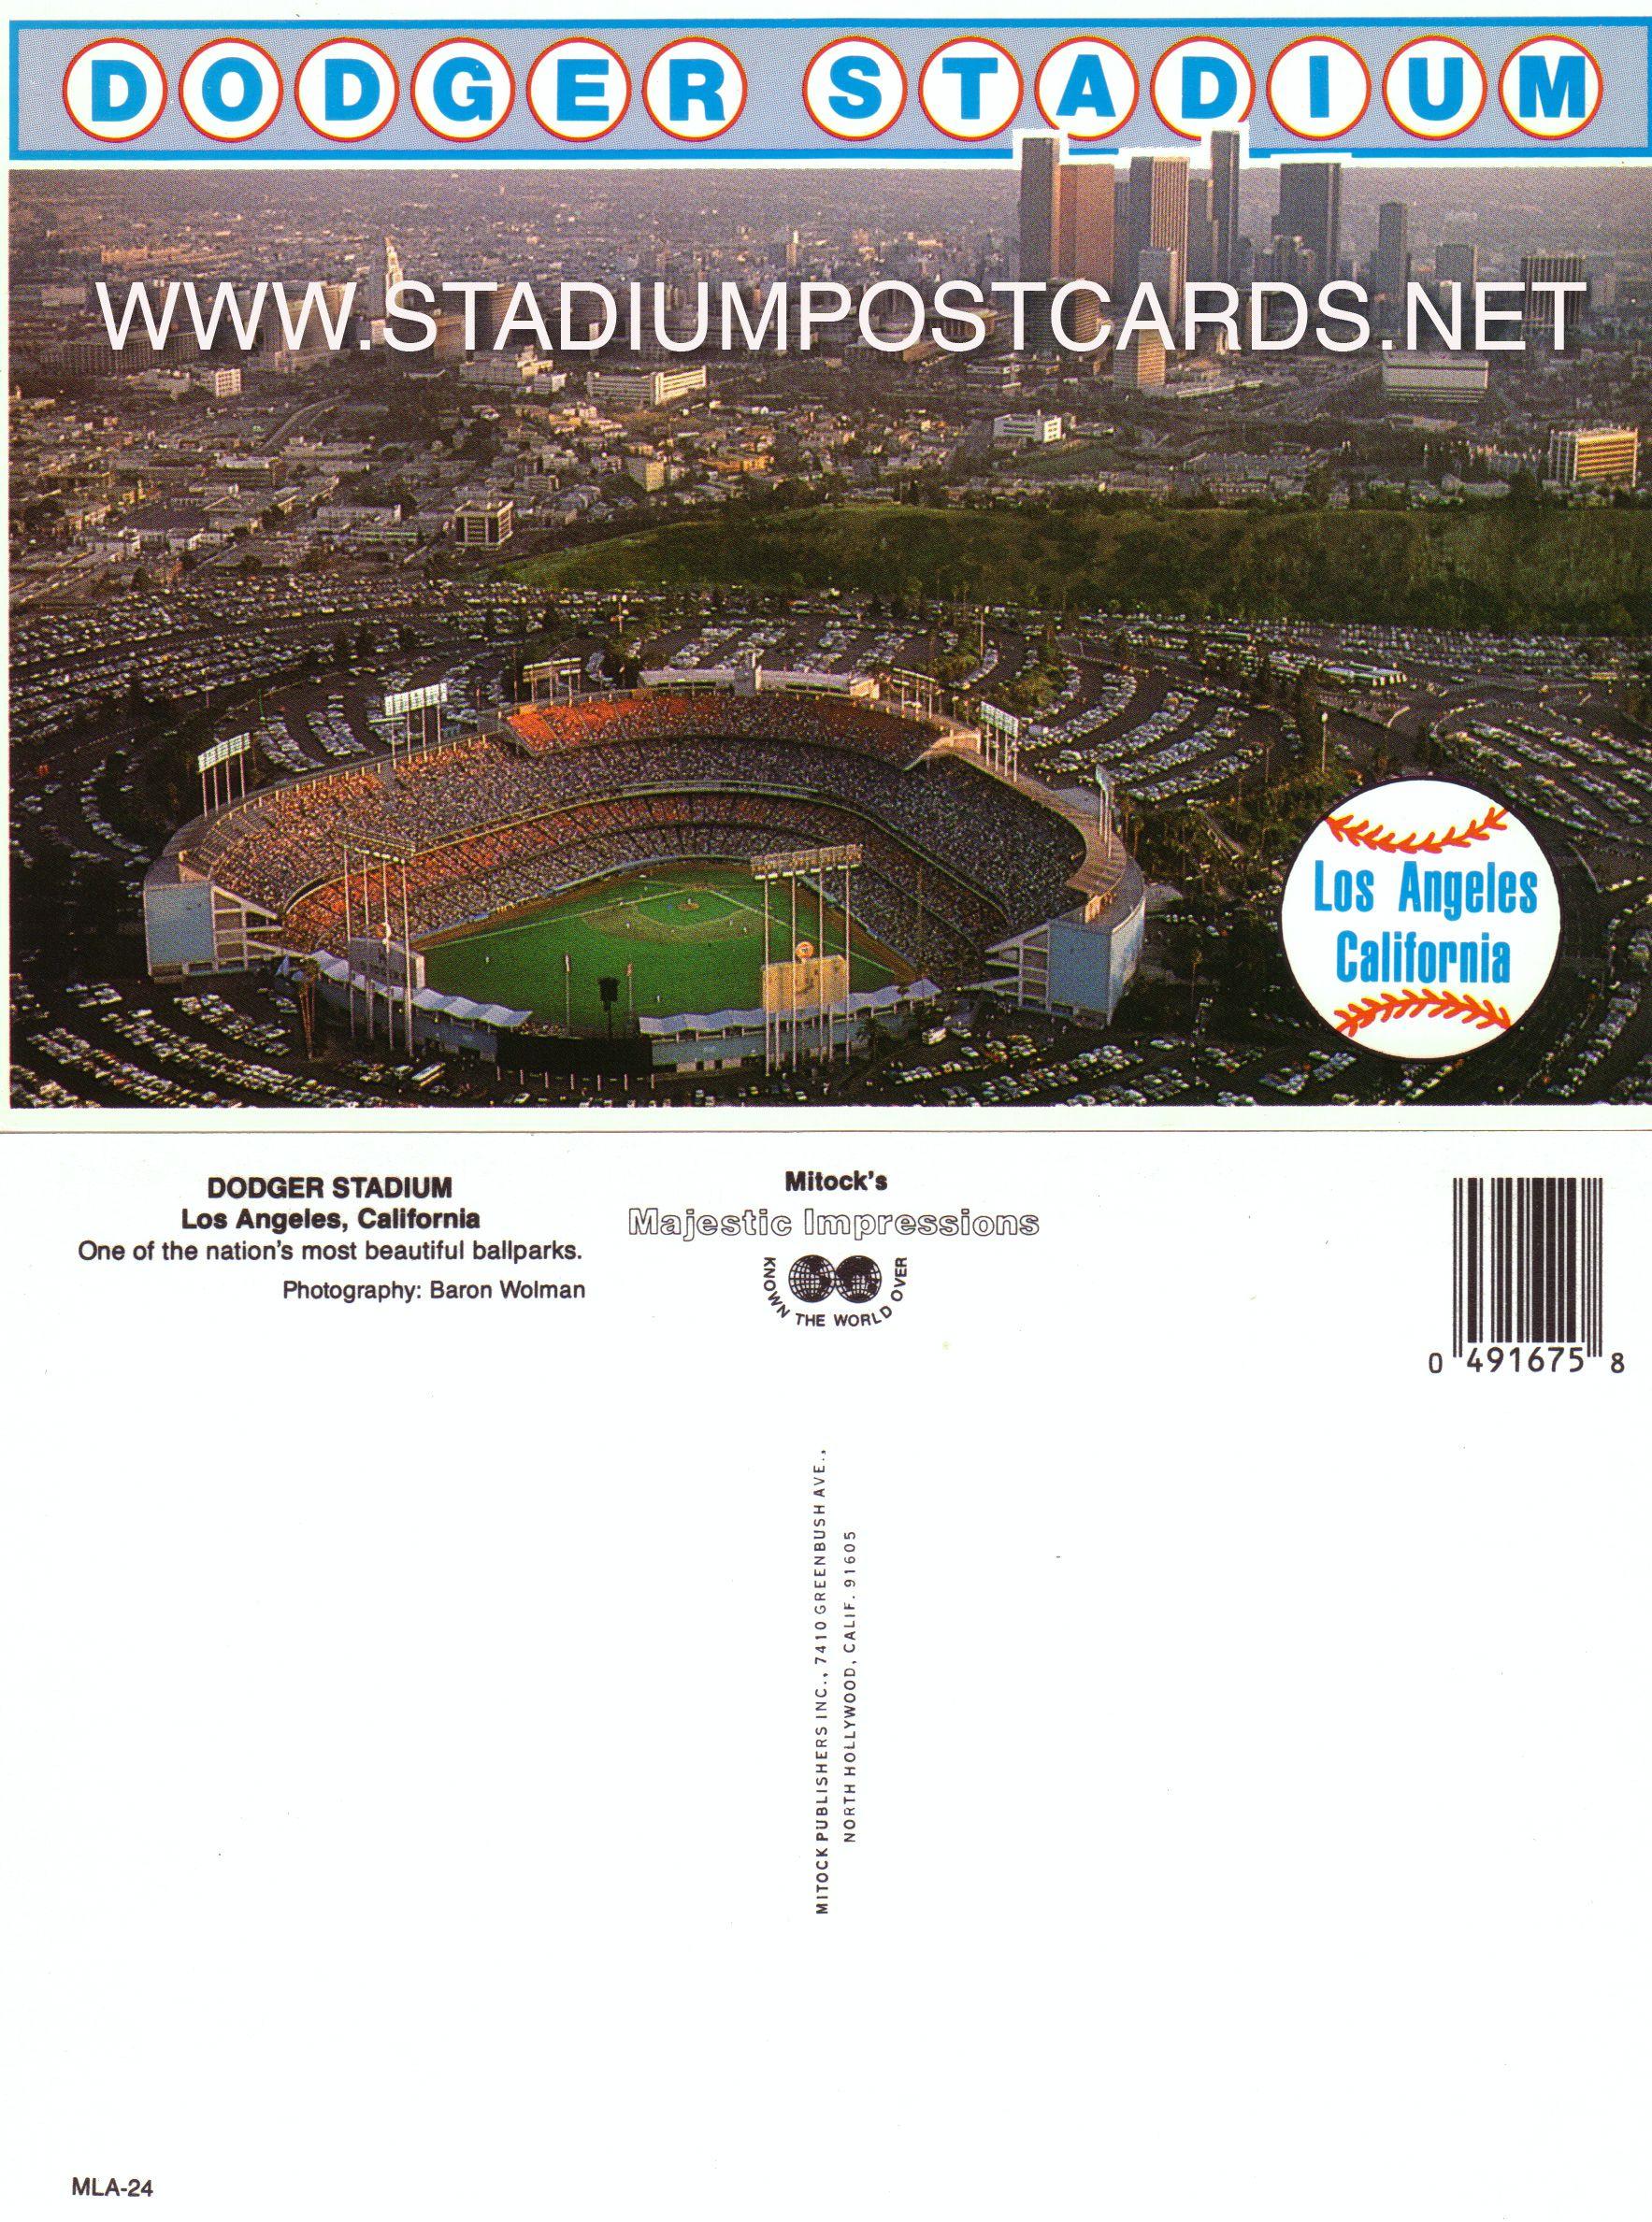 € 0,70 - code : USA-003 - Los Angeles - Dodger - stadium postcard cartolina stadio carte stade estadio tarjeta postal